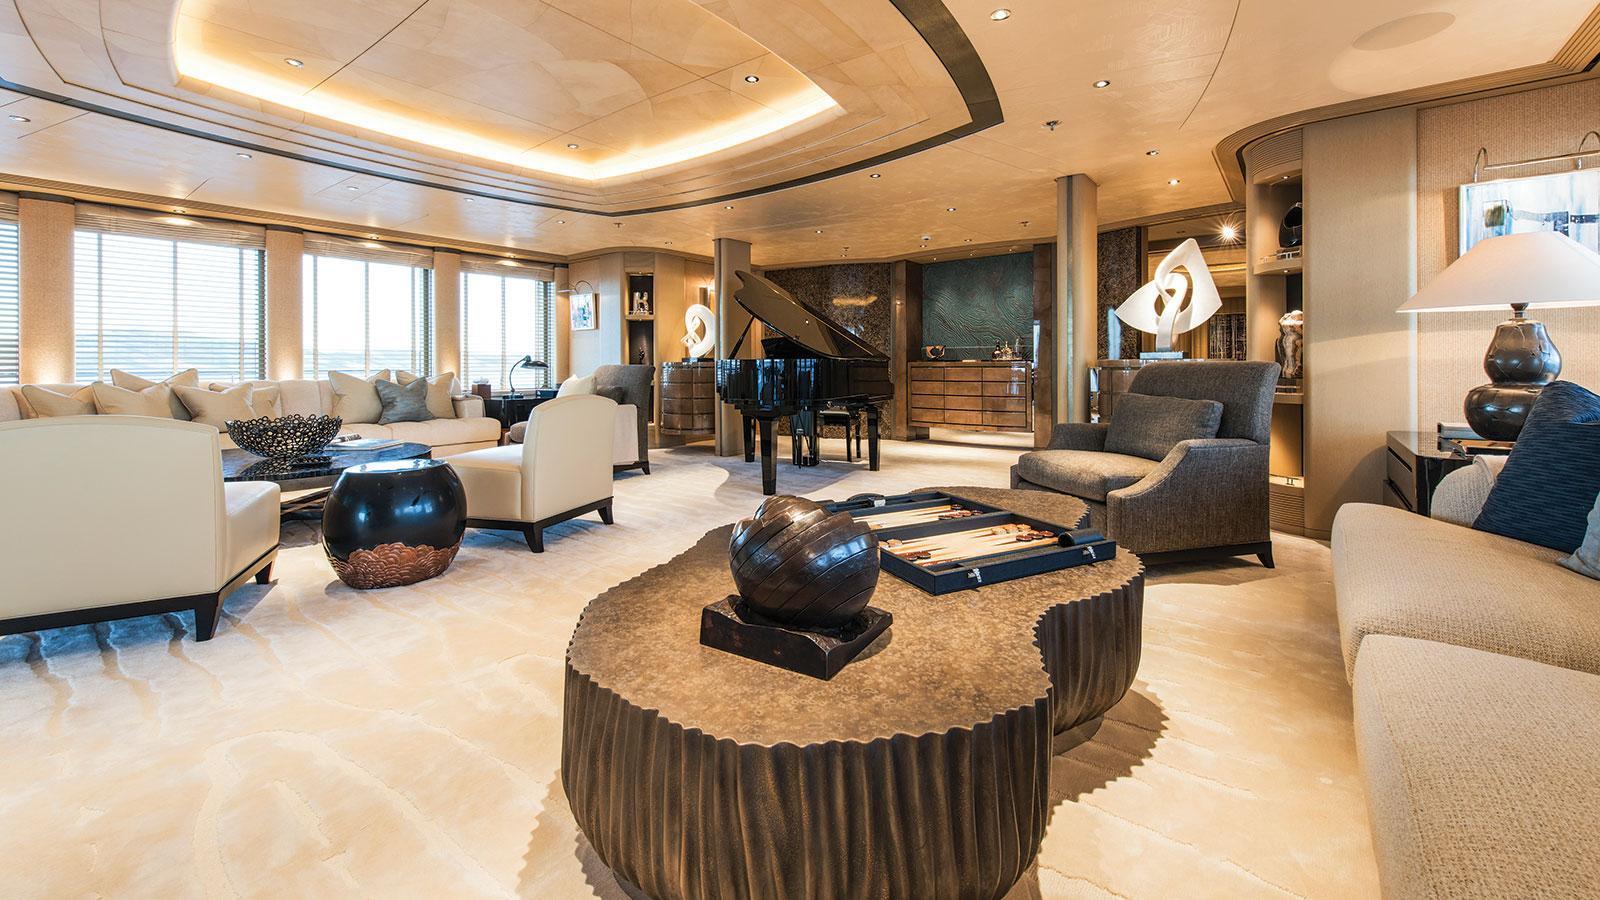 romea-motor-yacht-abeking-rasmussen-2015-82m-upper-saloon